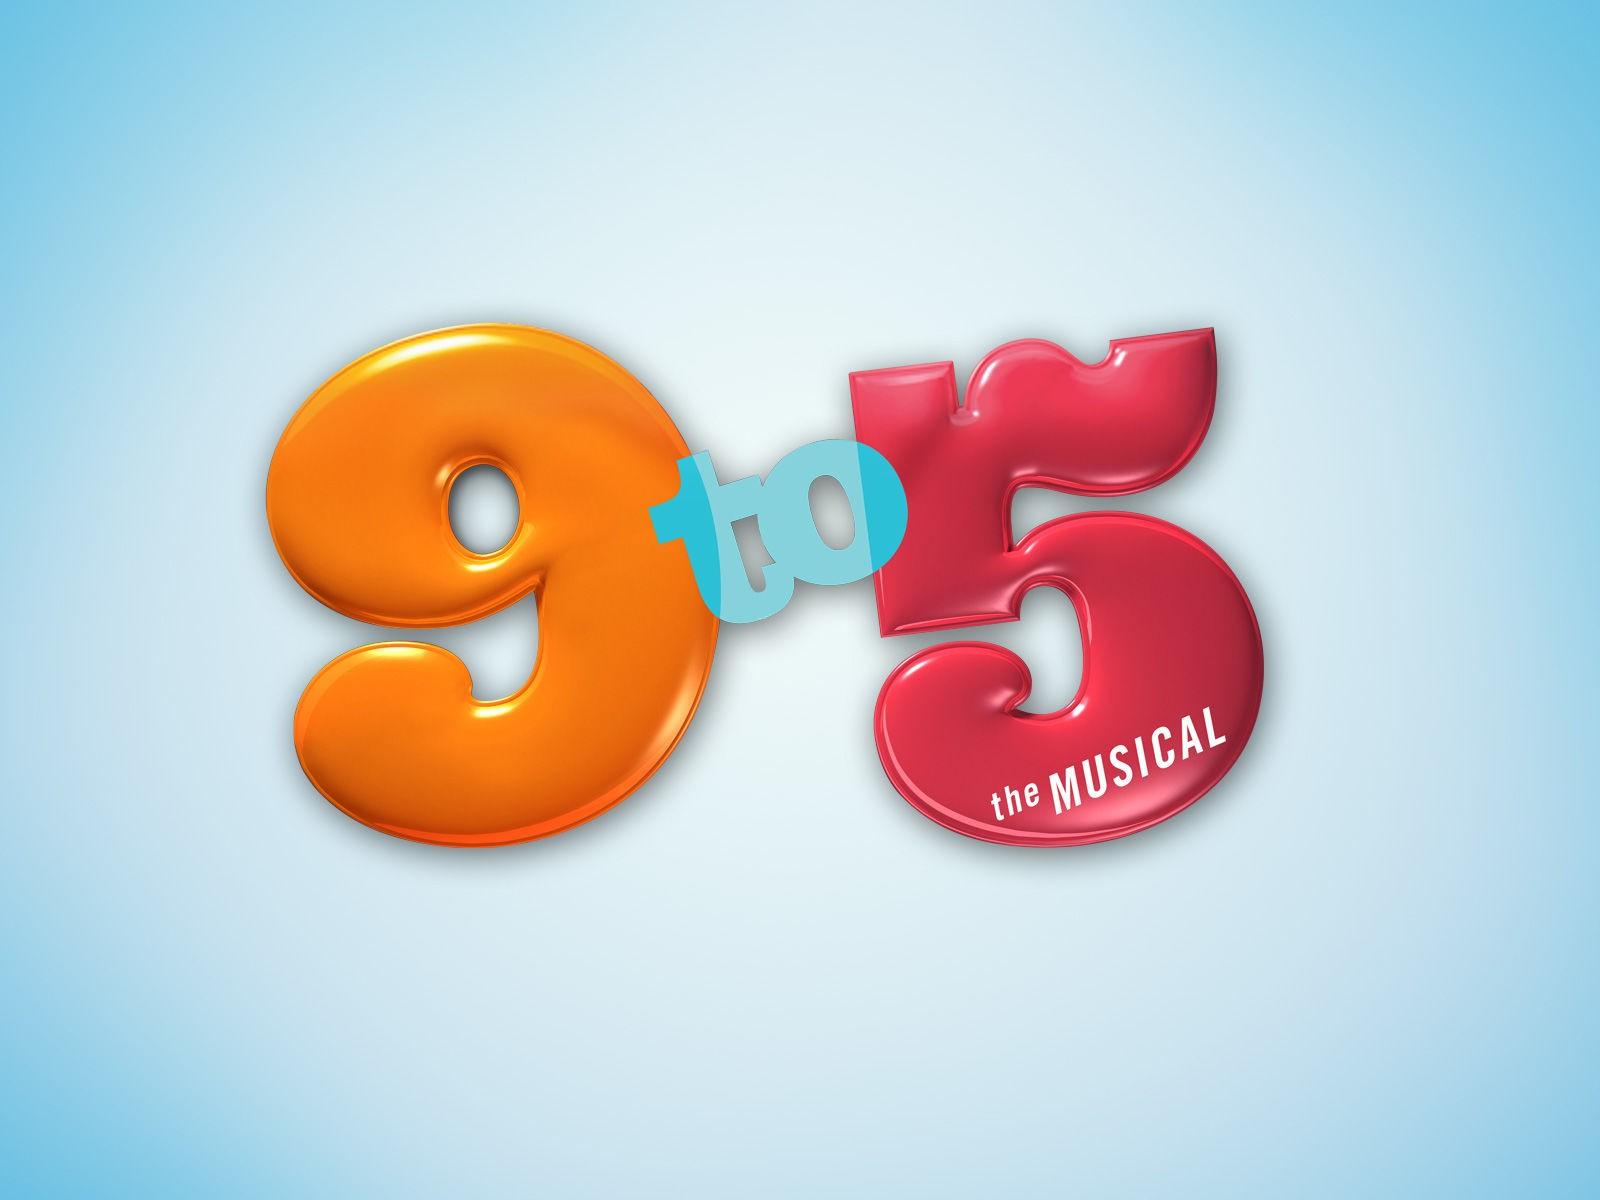 9to5 Logomotiv c First Stage - THEATER HIGHLIGHTS IM AUGUST